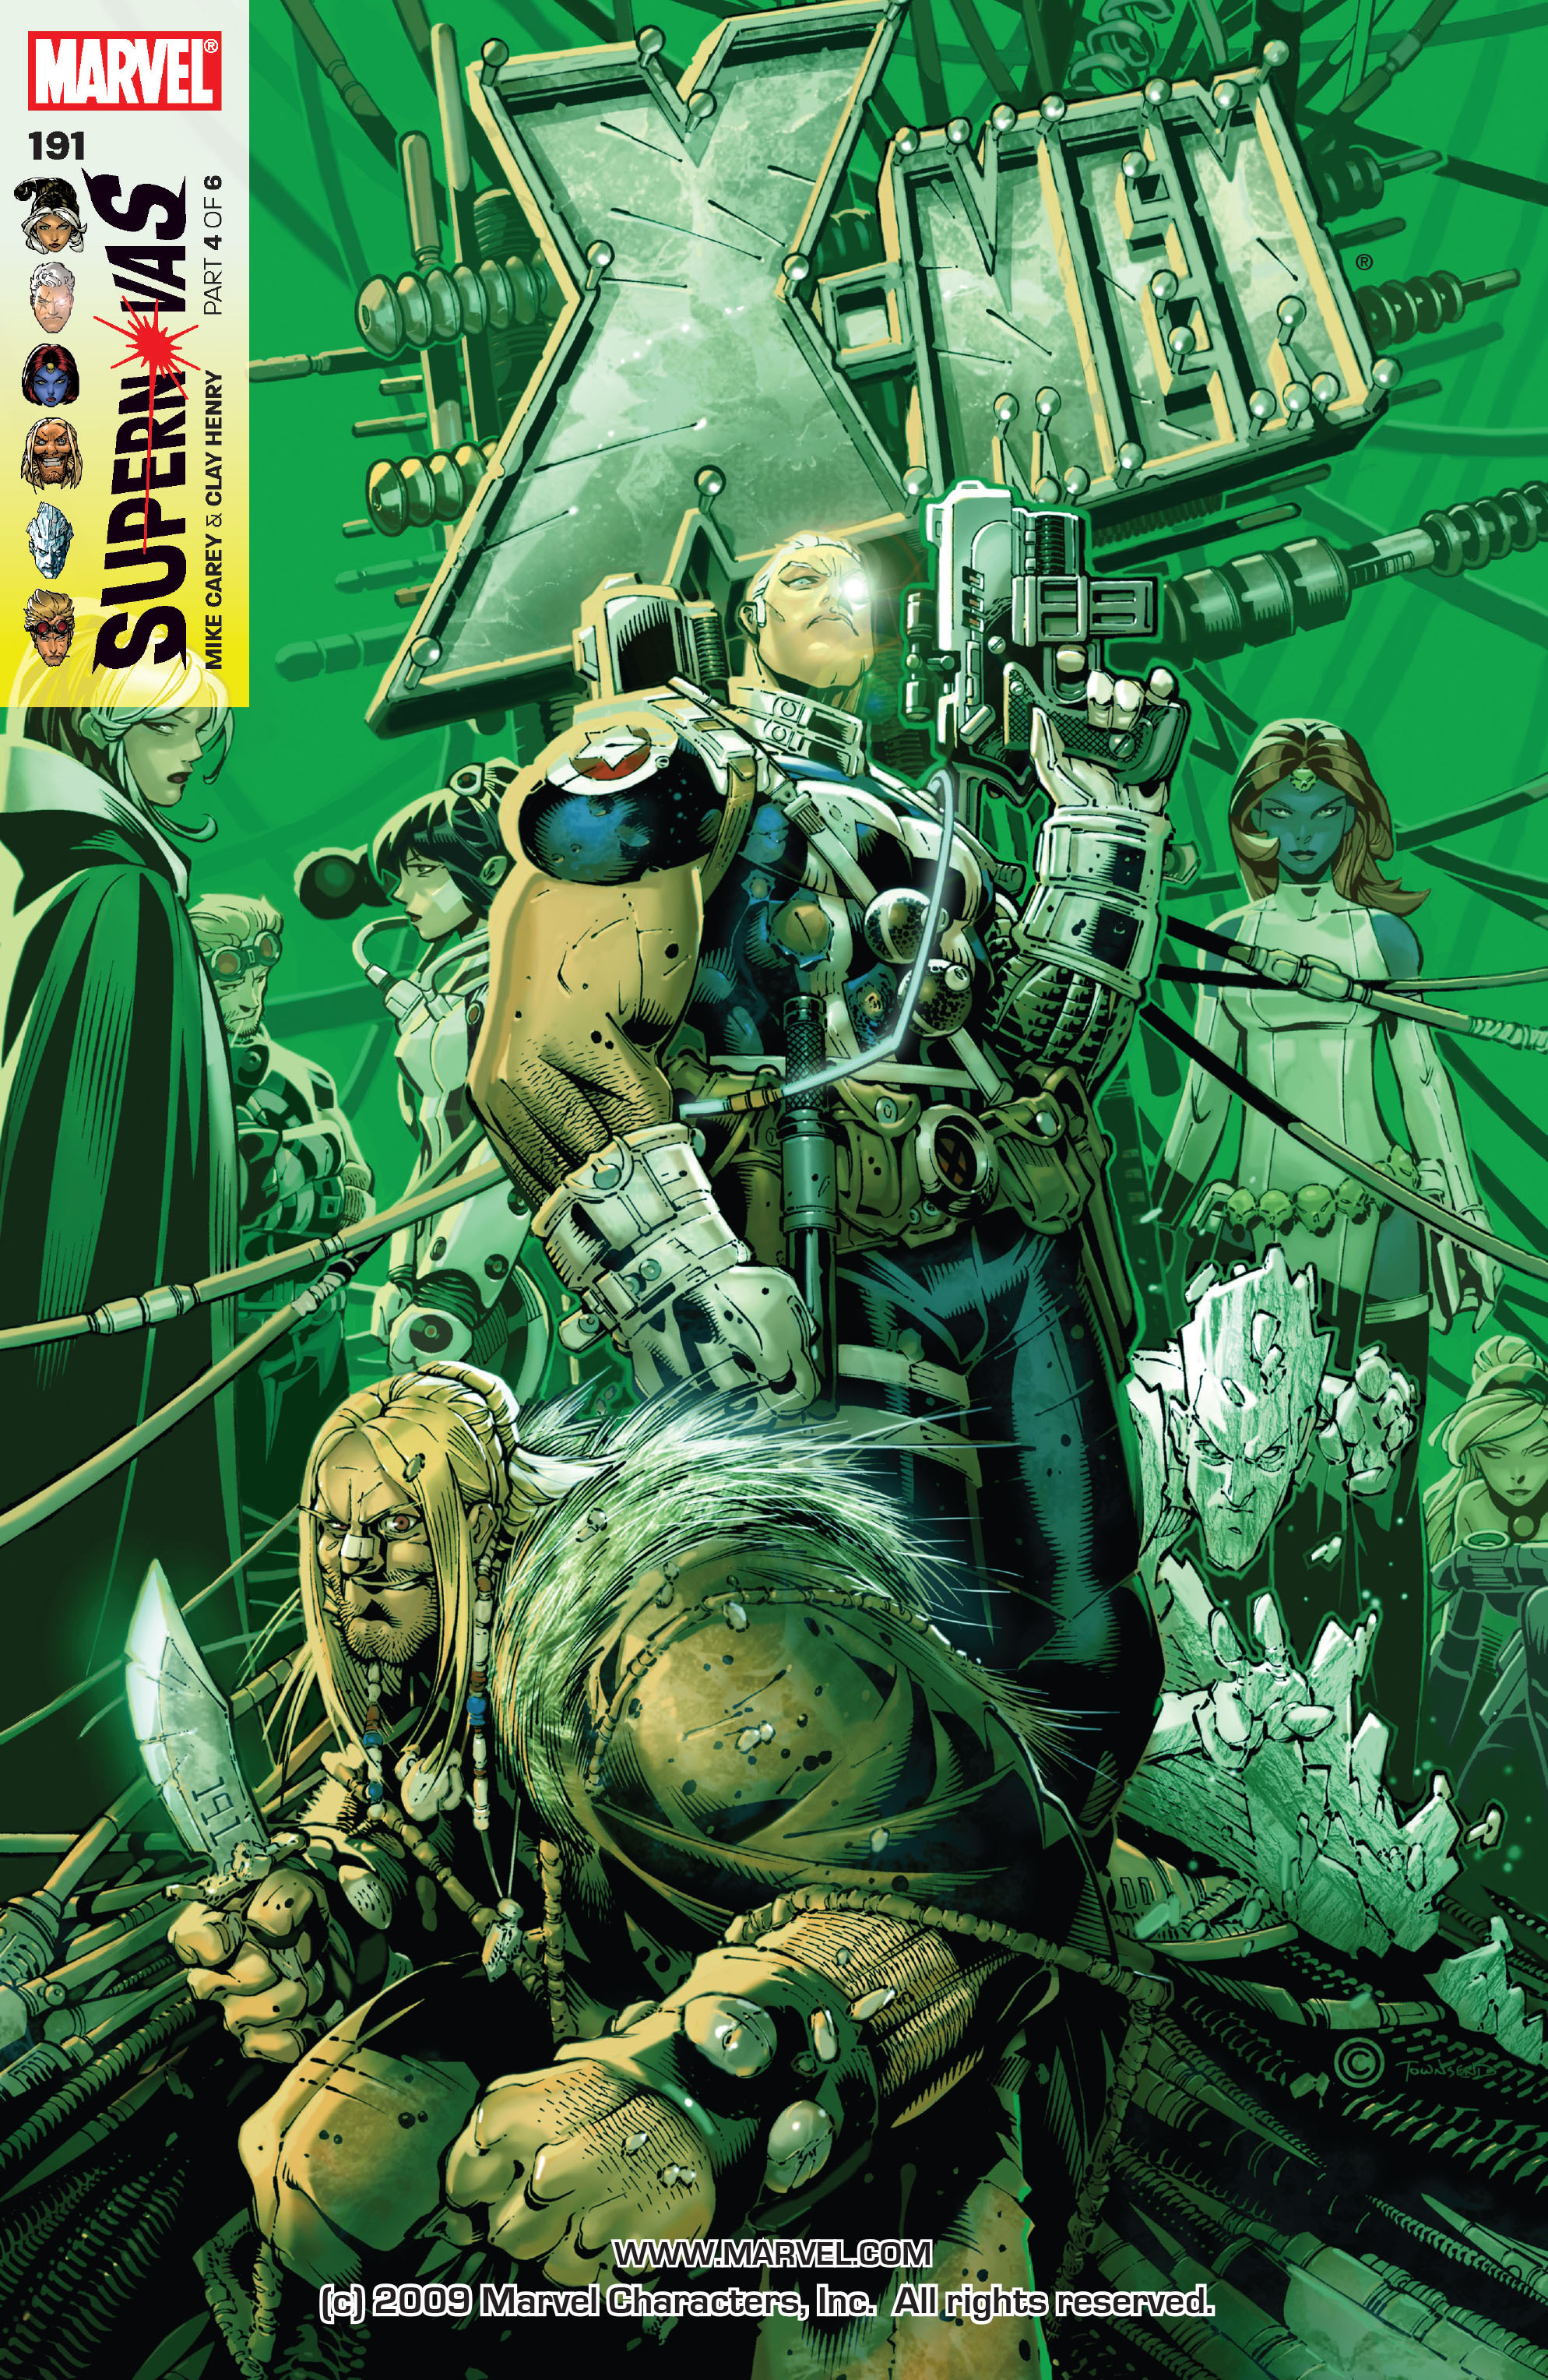 X-Men (1991) 191 Page 0